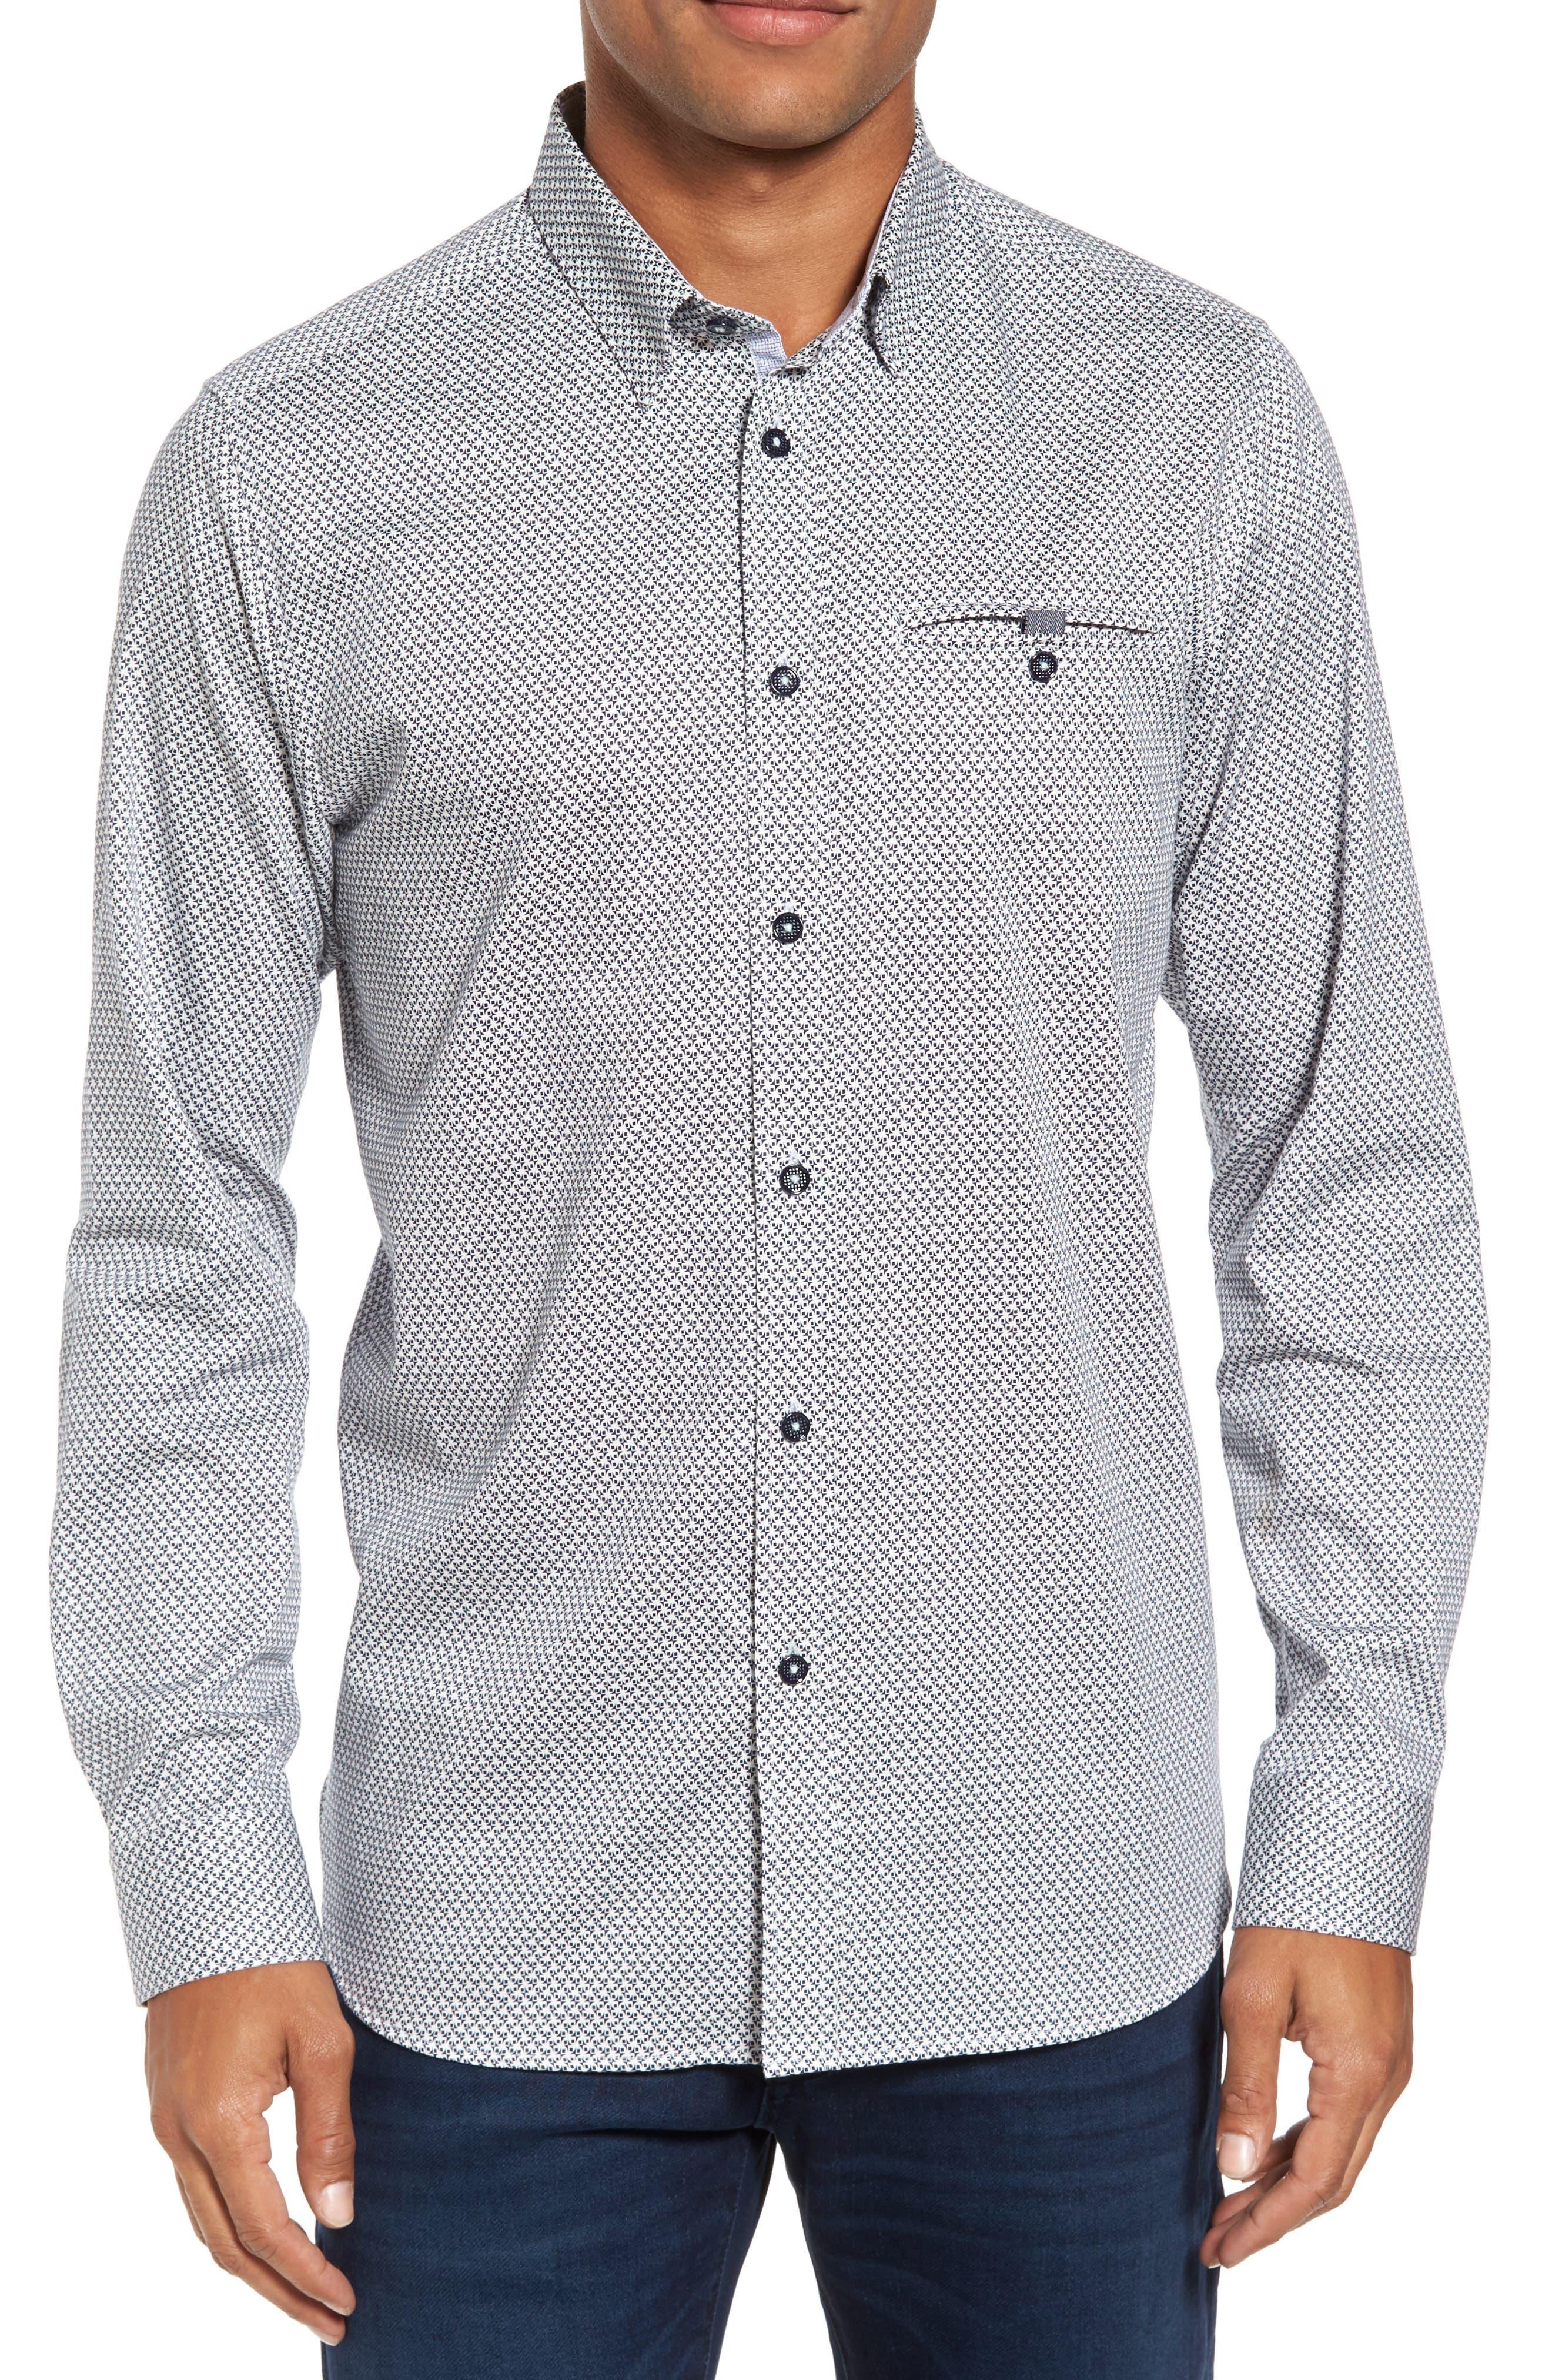 Main Image - Ted Baker London Vilamor Extra Slim Fit Print Sport Shirt